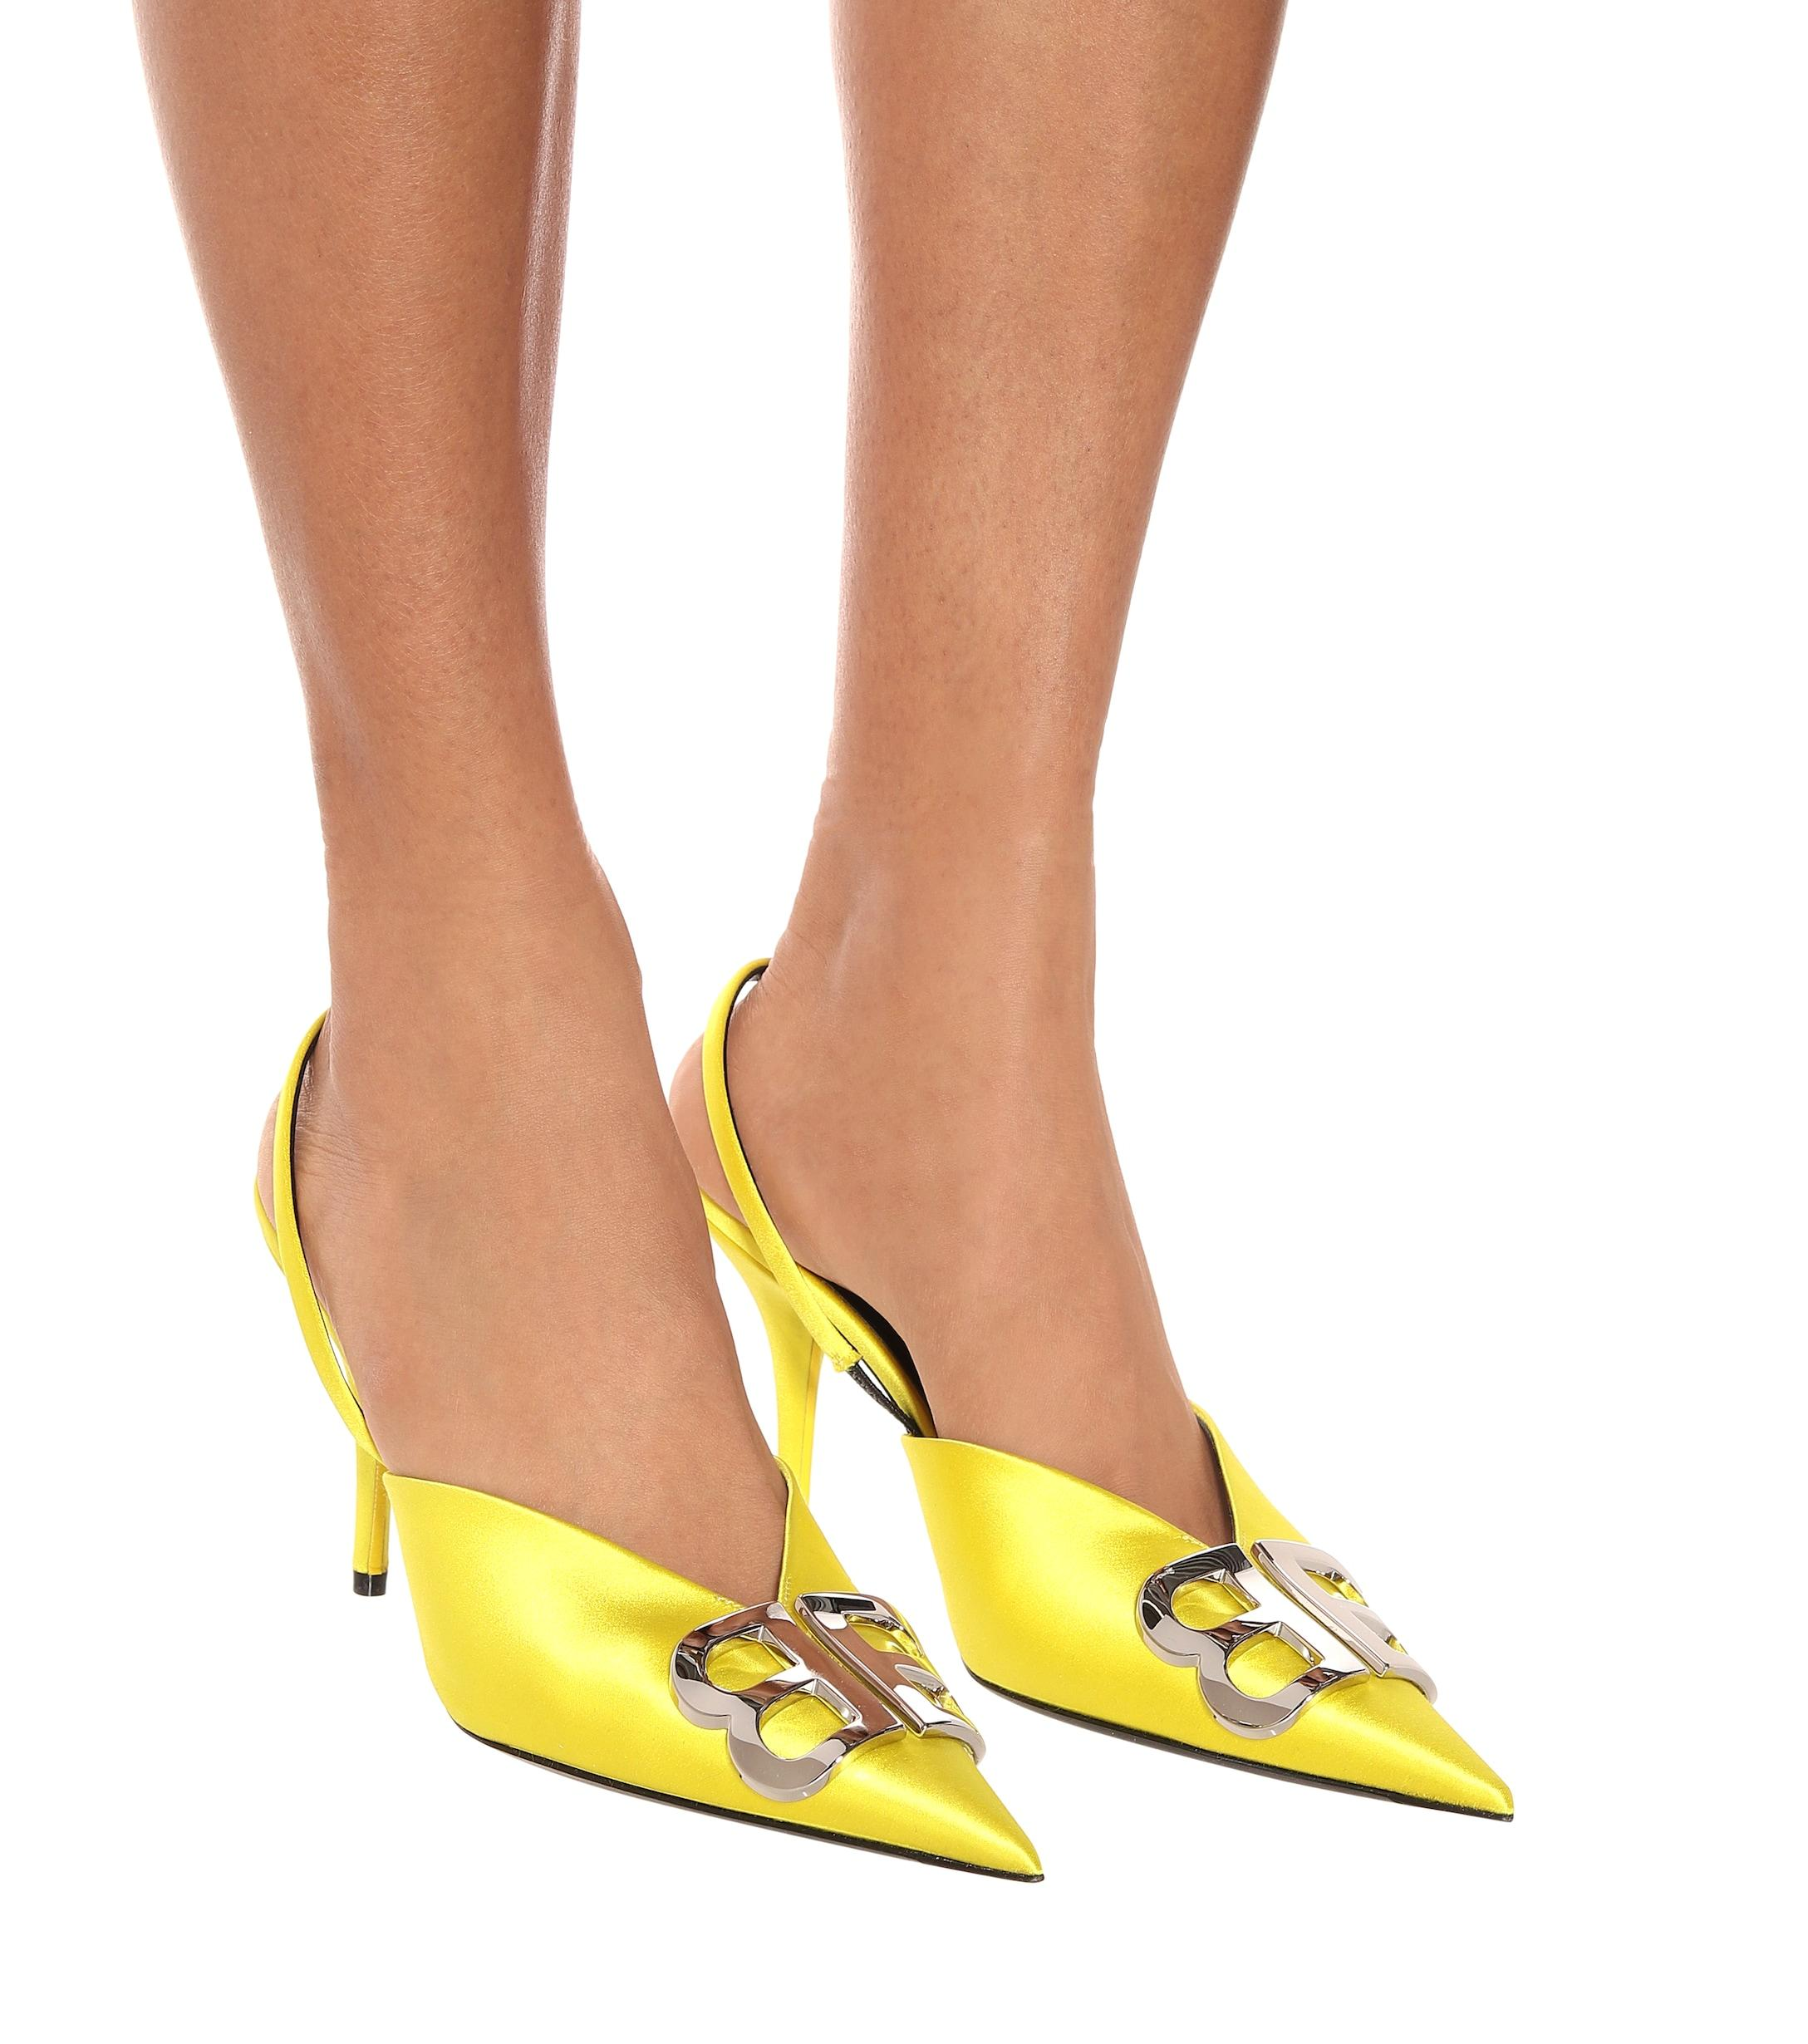 Salones BB de satén destalonados Balenciaga de Raso de color Amarillo